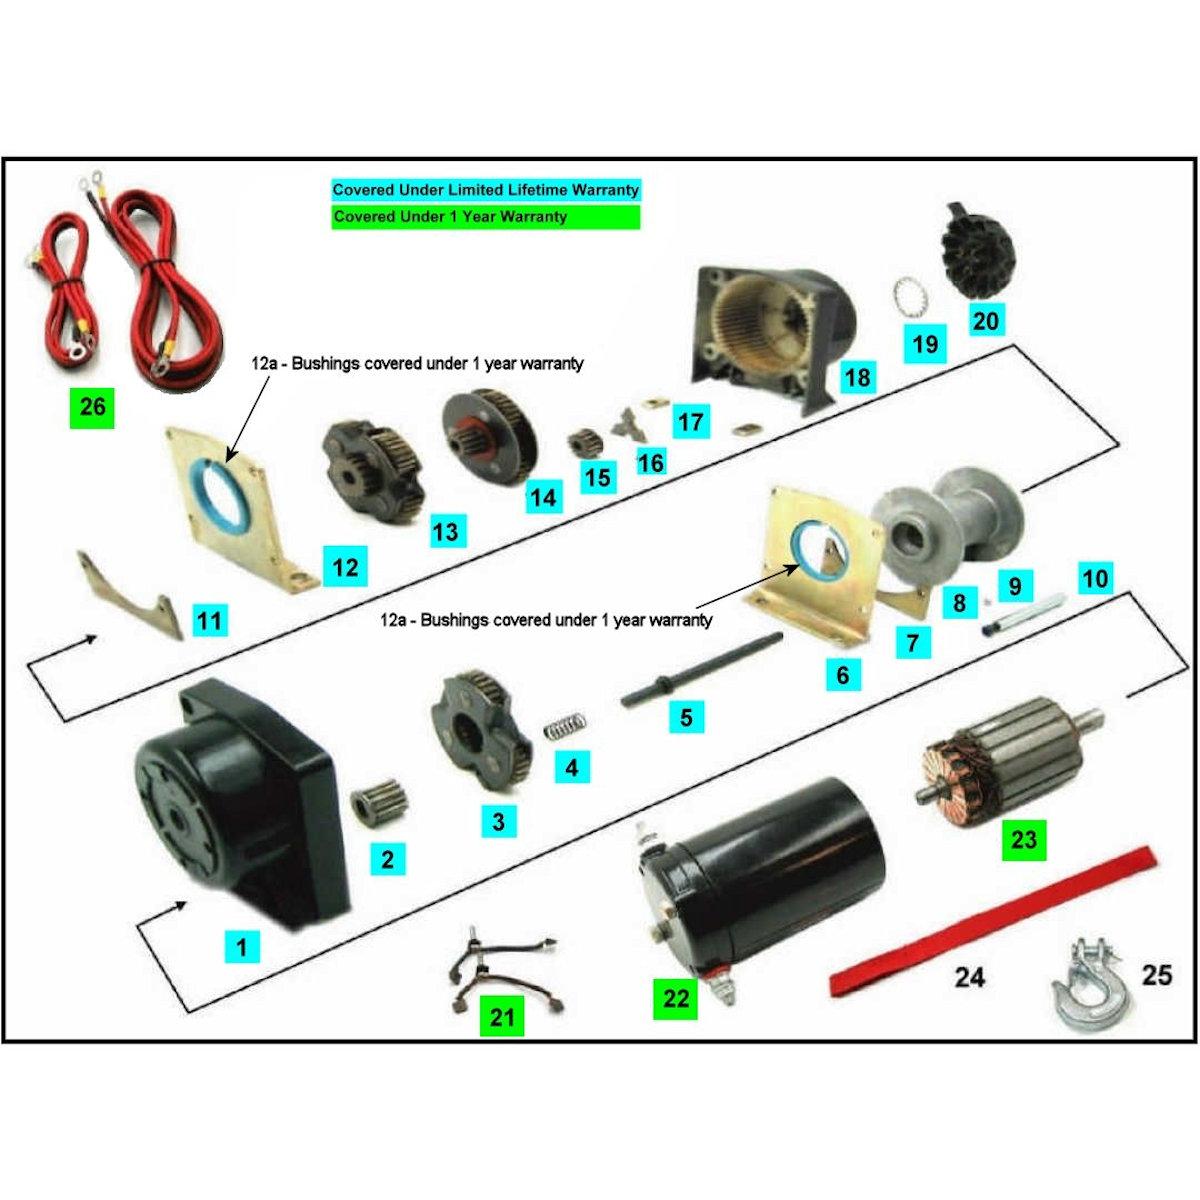 Polaris 4500 Winch Parts Diagram   Wiring Diagram Liry on cheap polaris ranger xp winch, pure polaris winch, polaris ranger front winch,